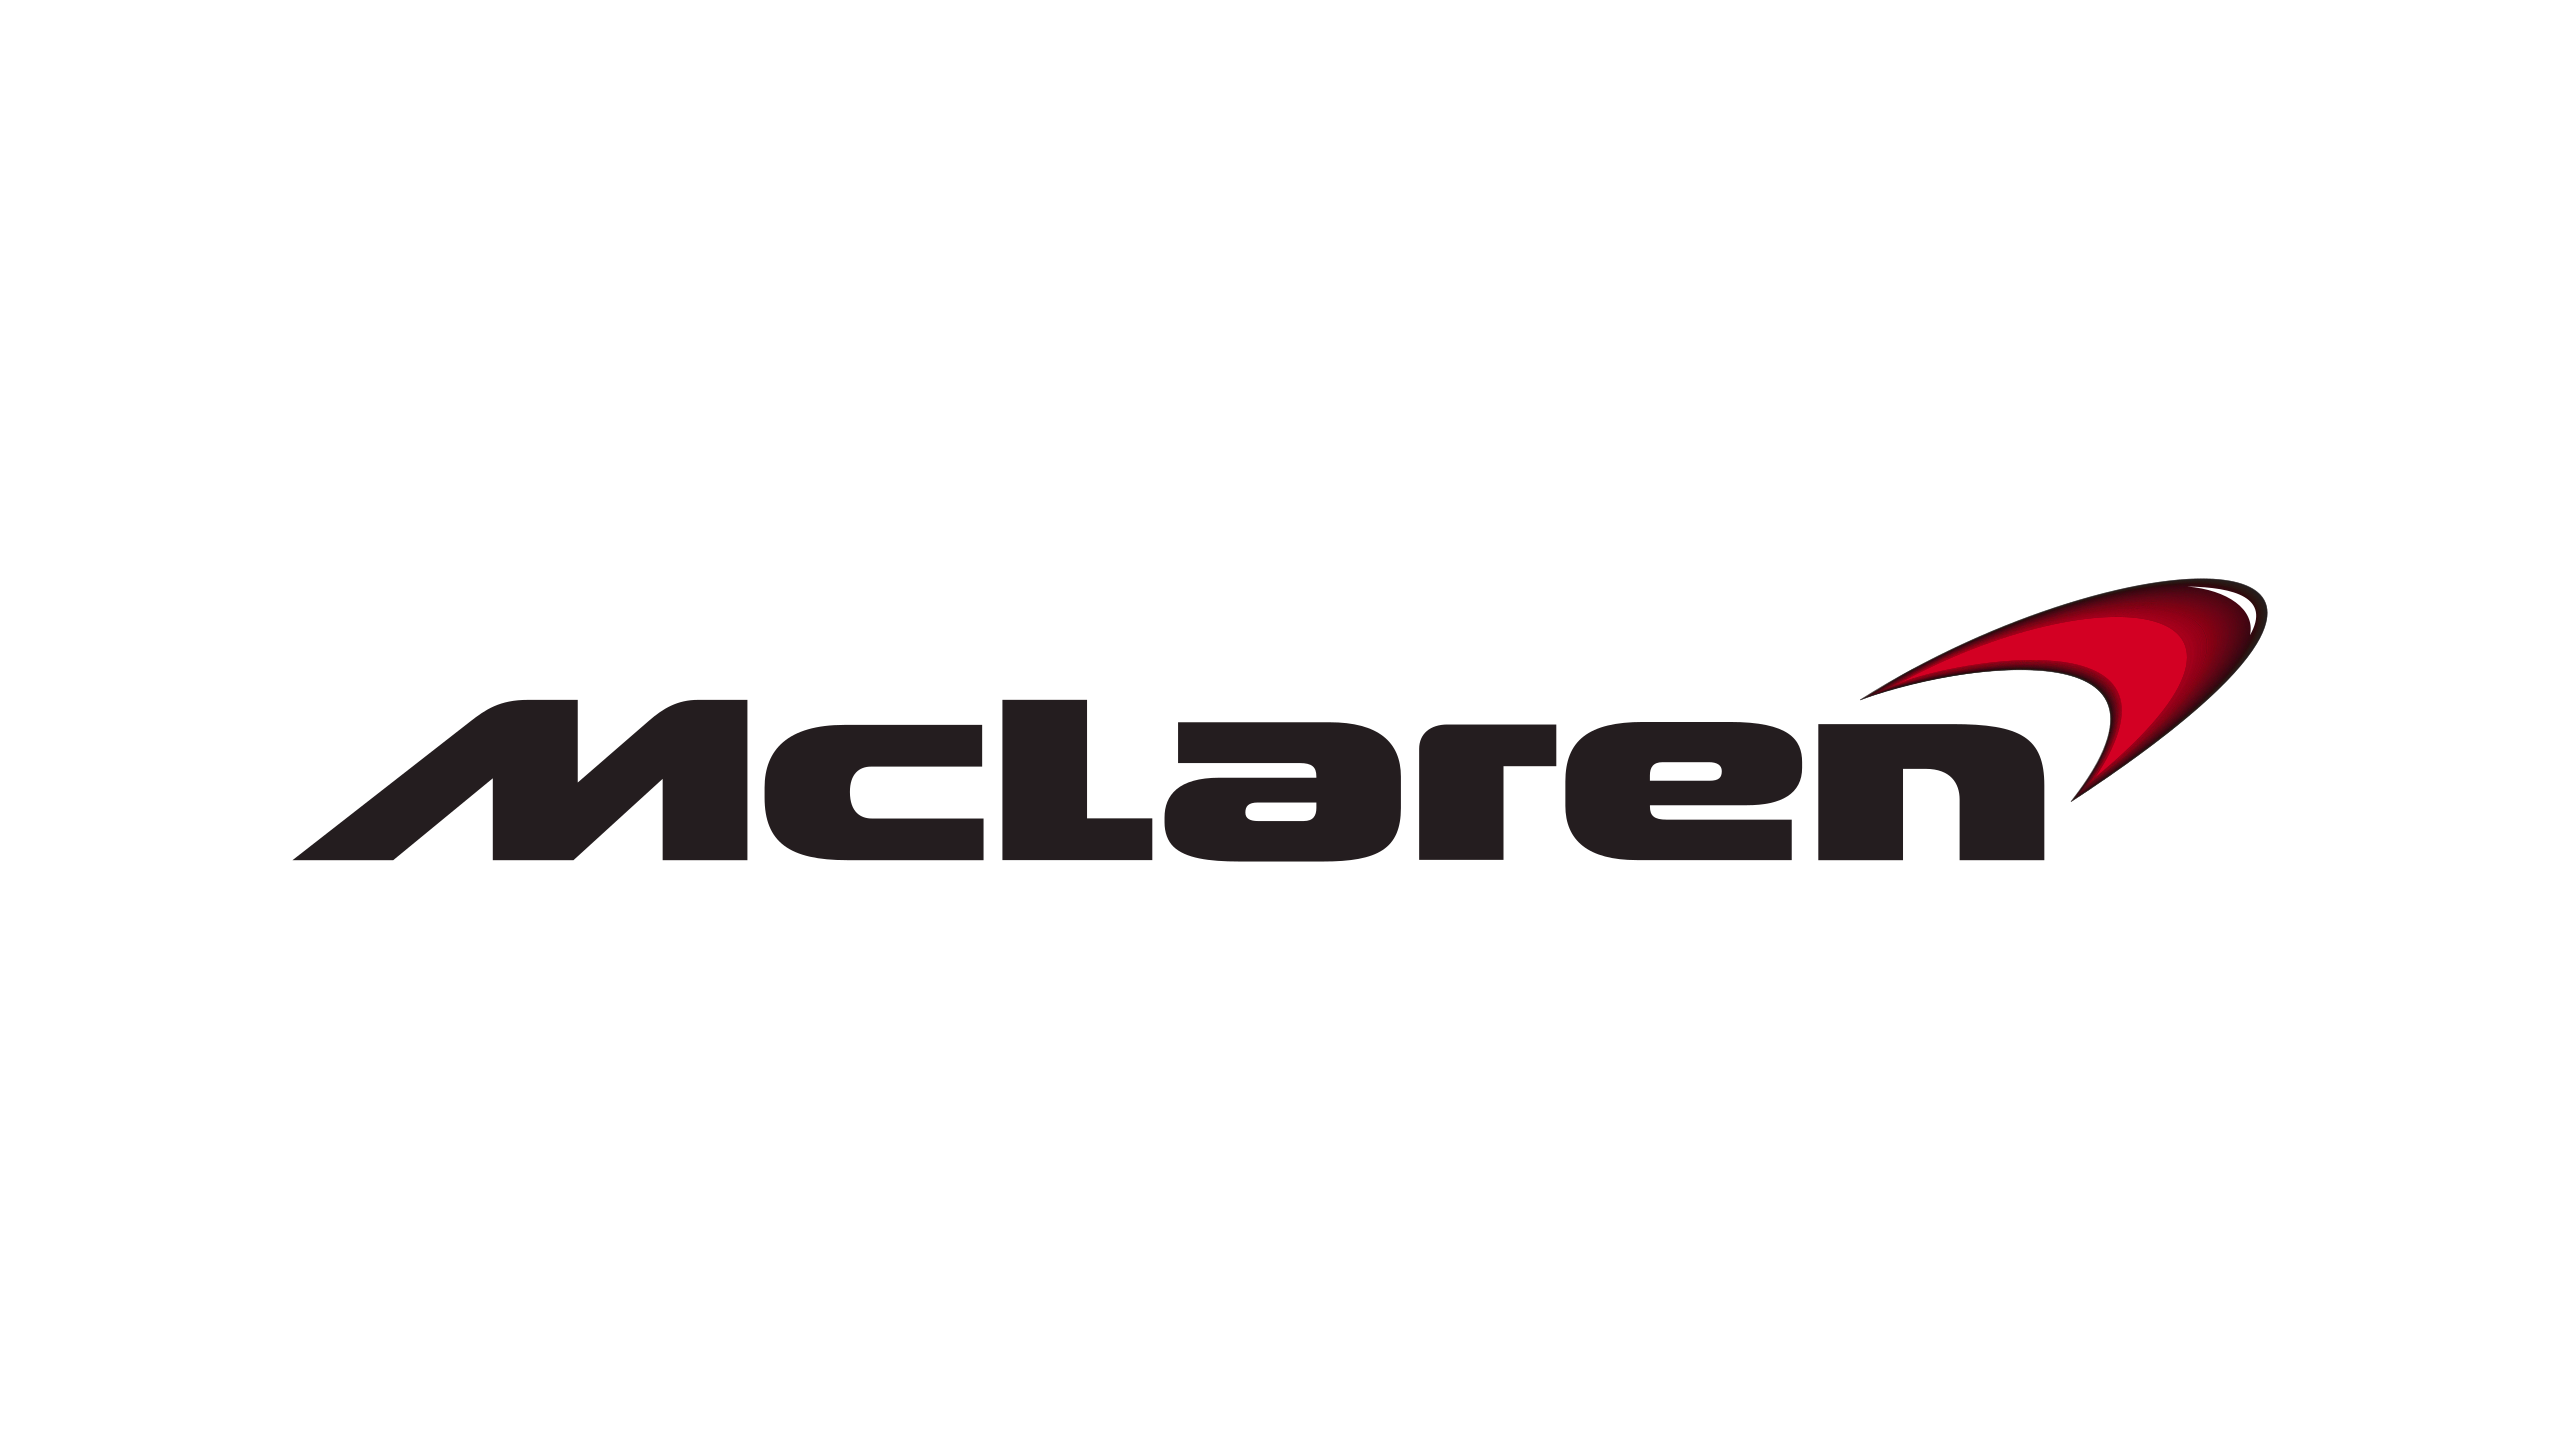 McLaren Logo (2002-Present) 2560x1440 HD png - Mclaren Logo PNG